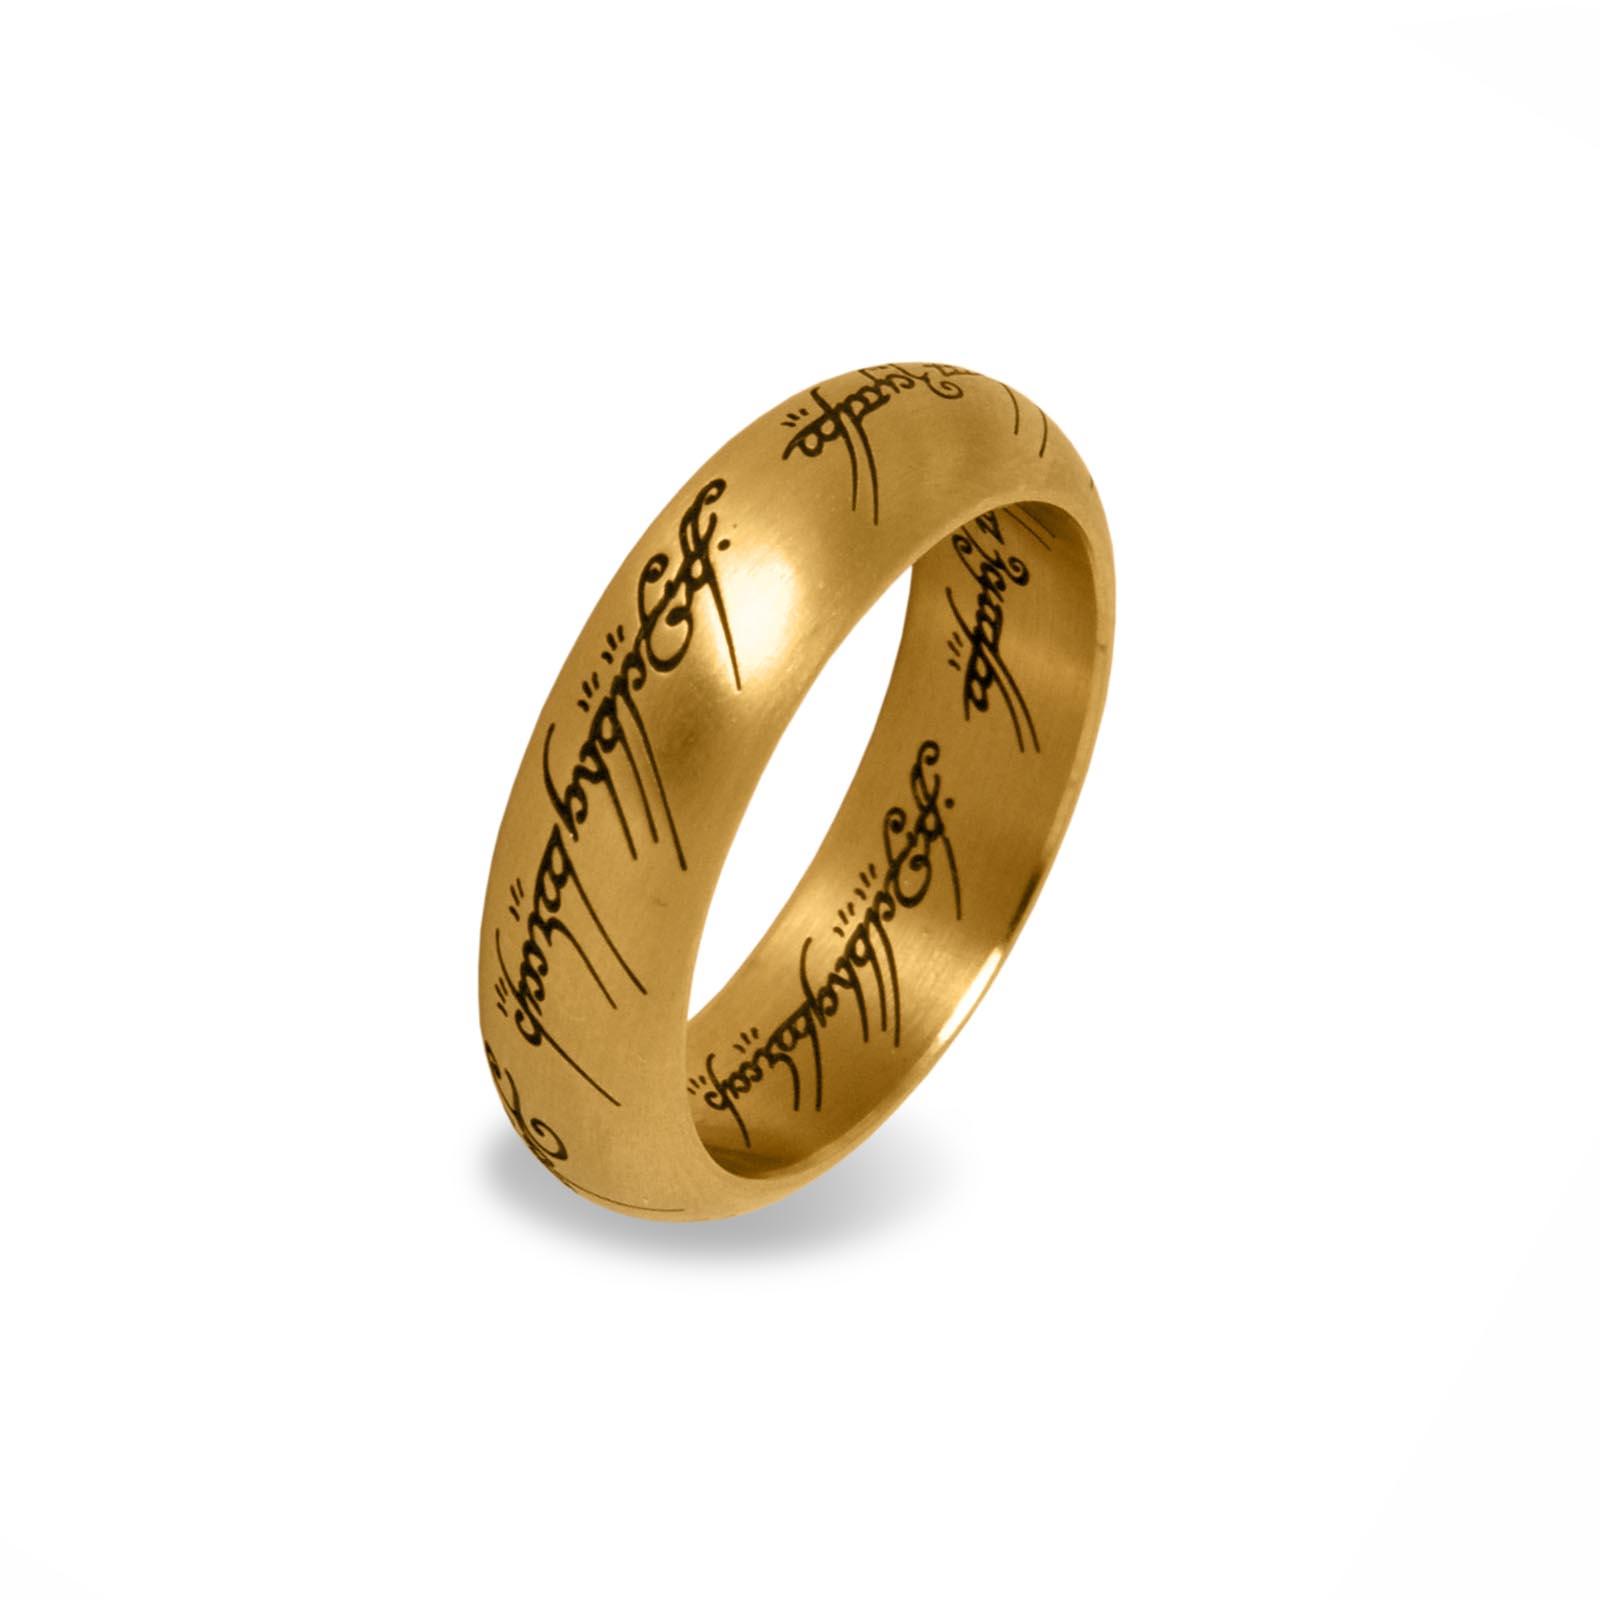 herr der ringe der eine ring im schmuckdisplay gold offizieller warner bros shop. Black Bedroom Furniture Sets. Home Design Ideas